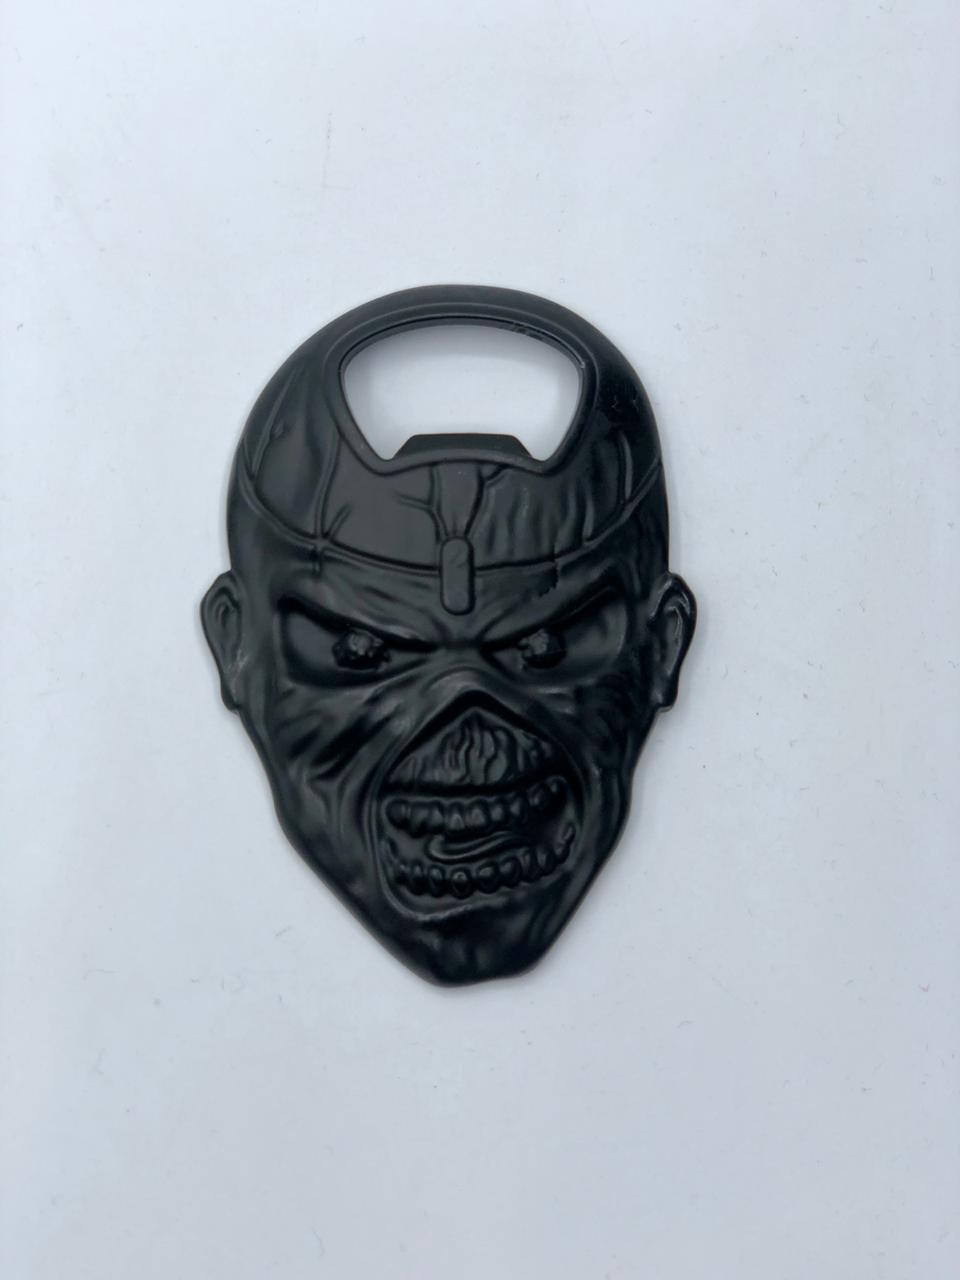 Abridor de Garrafas Com Imã Eddie: Iron Maiden (Preto)